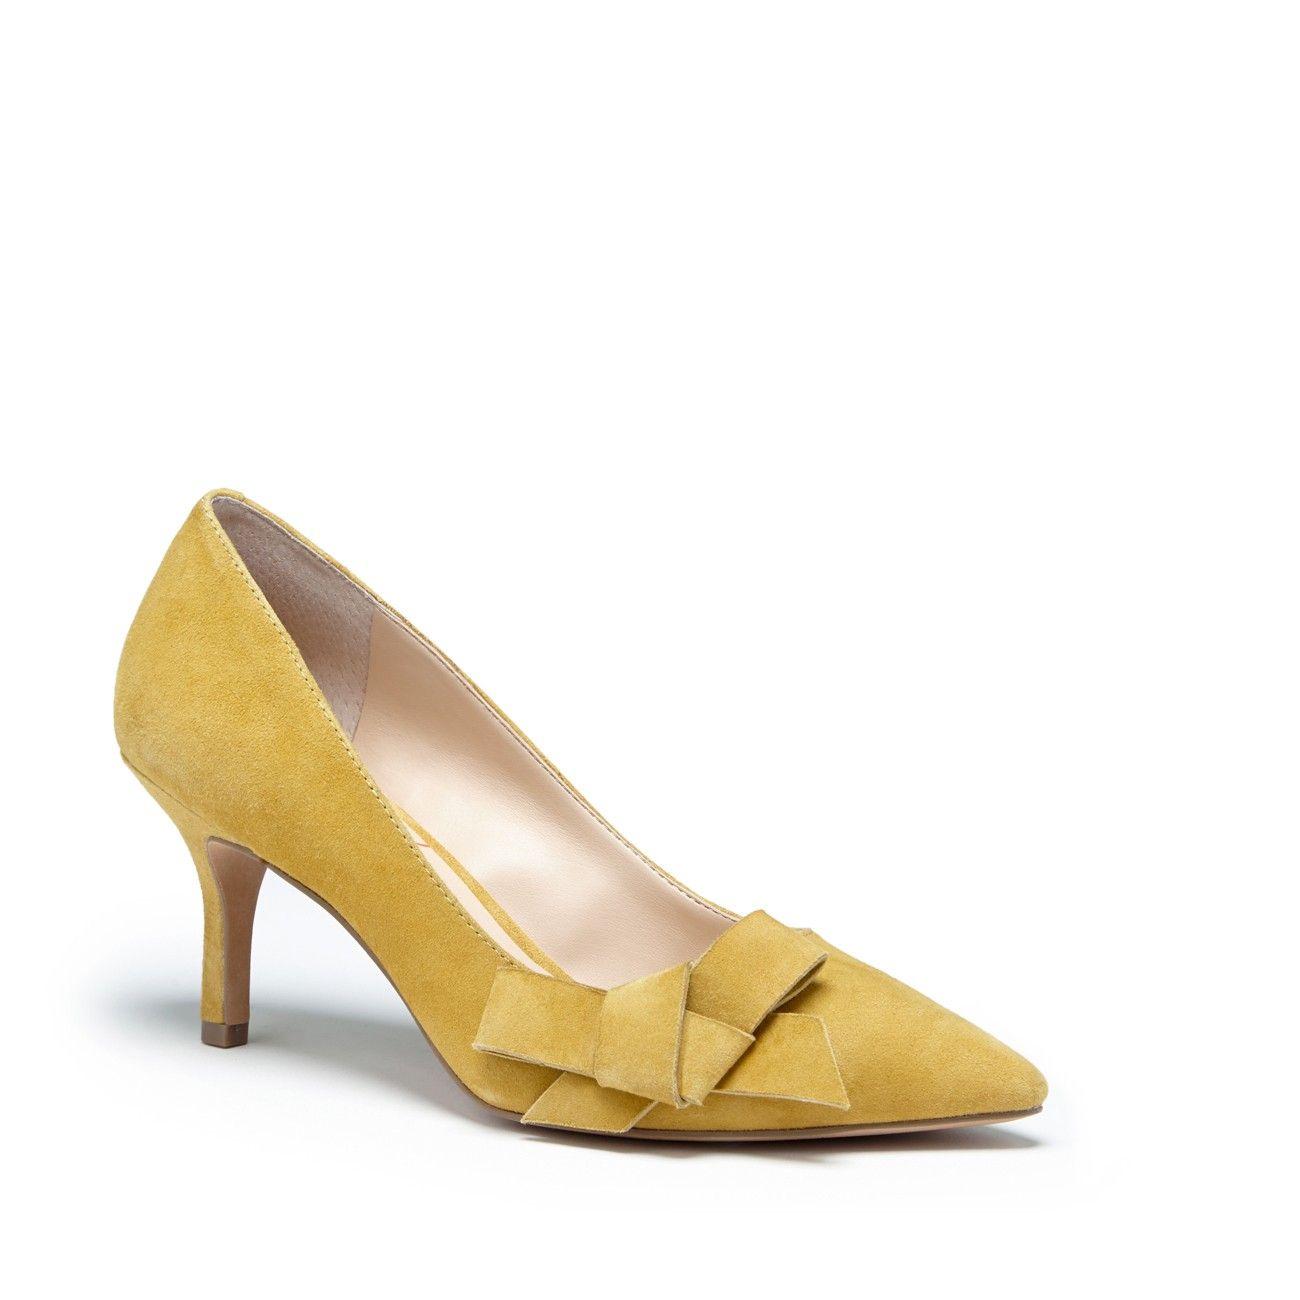 Women S Mustard Suede 2 1 2 Inch Suede Mid Heel Pump Jensine By Sole Society Heels Pumps Heels Shoes